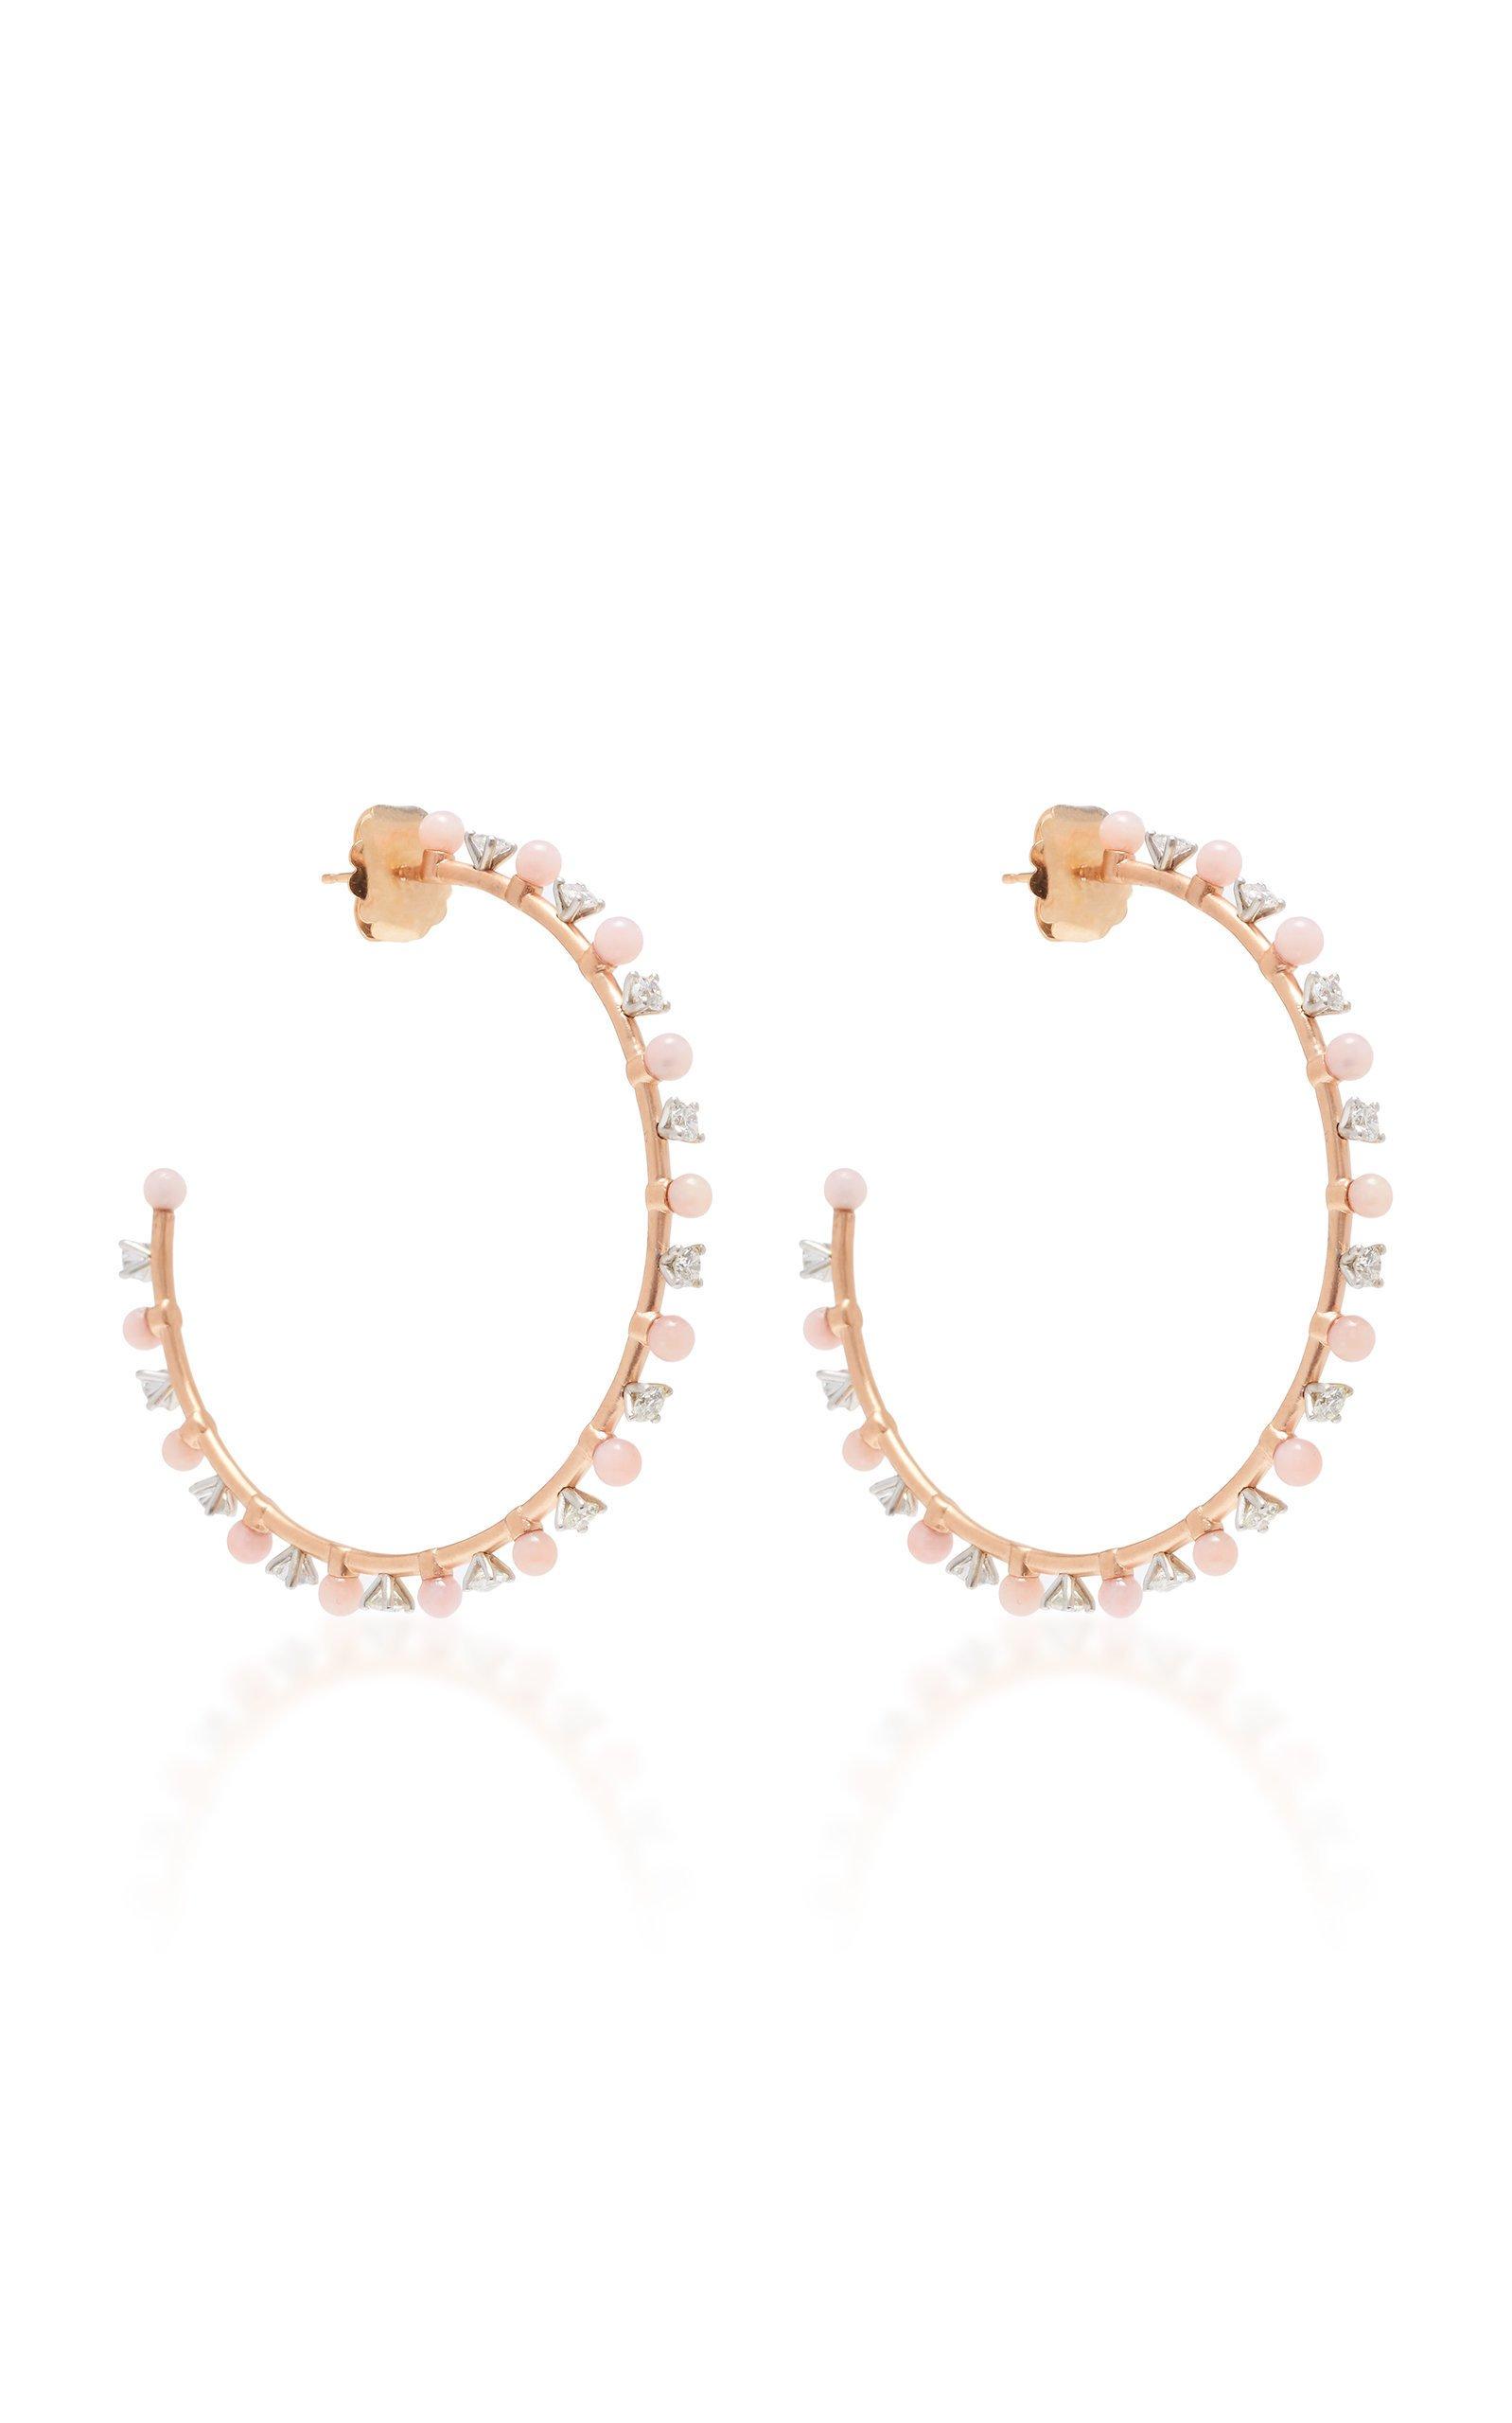 Irene Neuwirth One-Of-A-Kind 18K White And Rose Gold Hoop Earrings